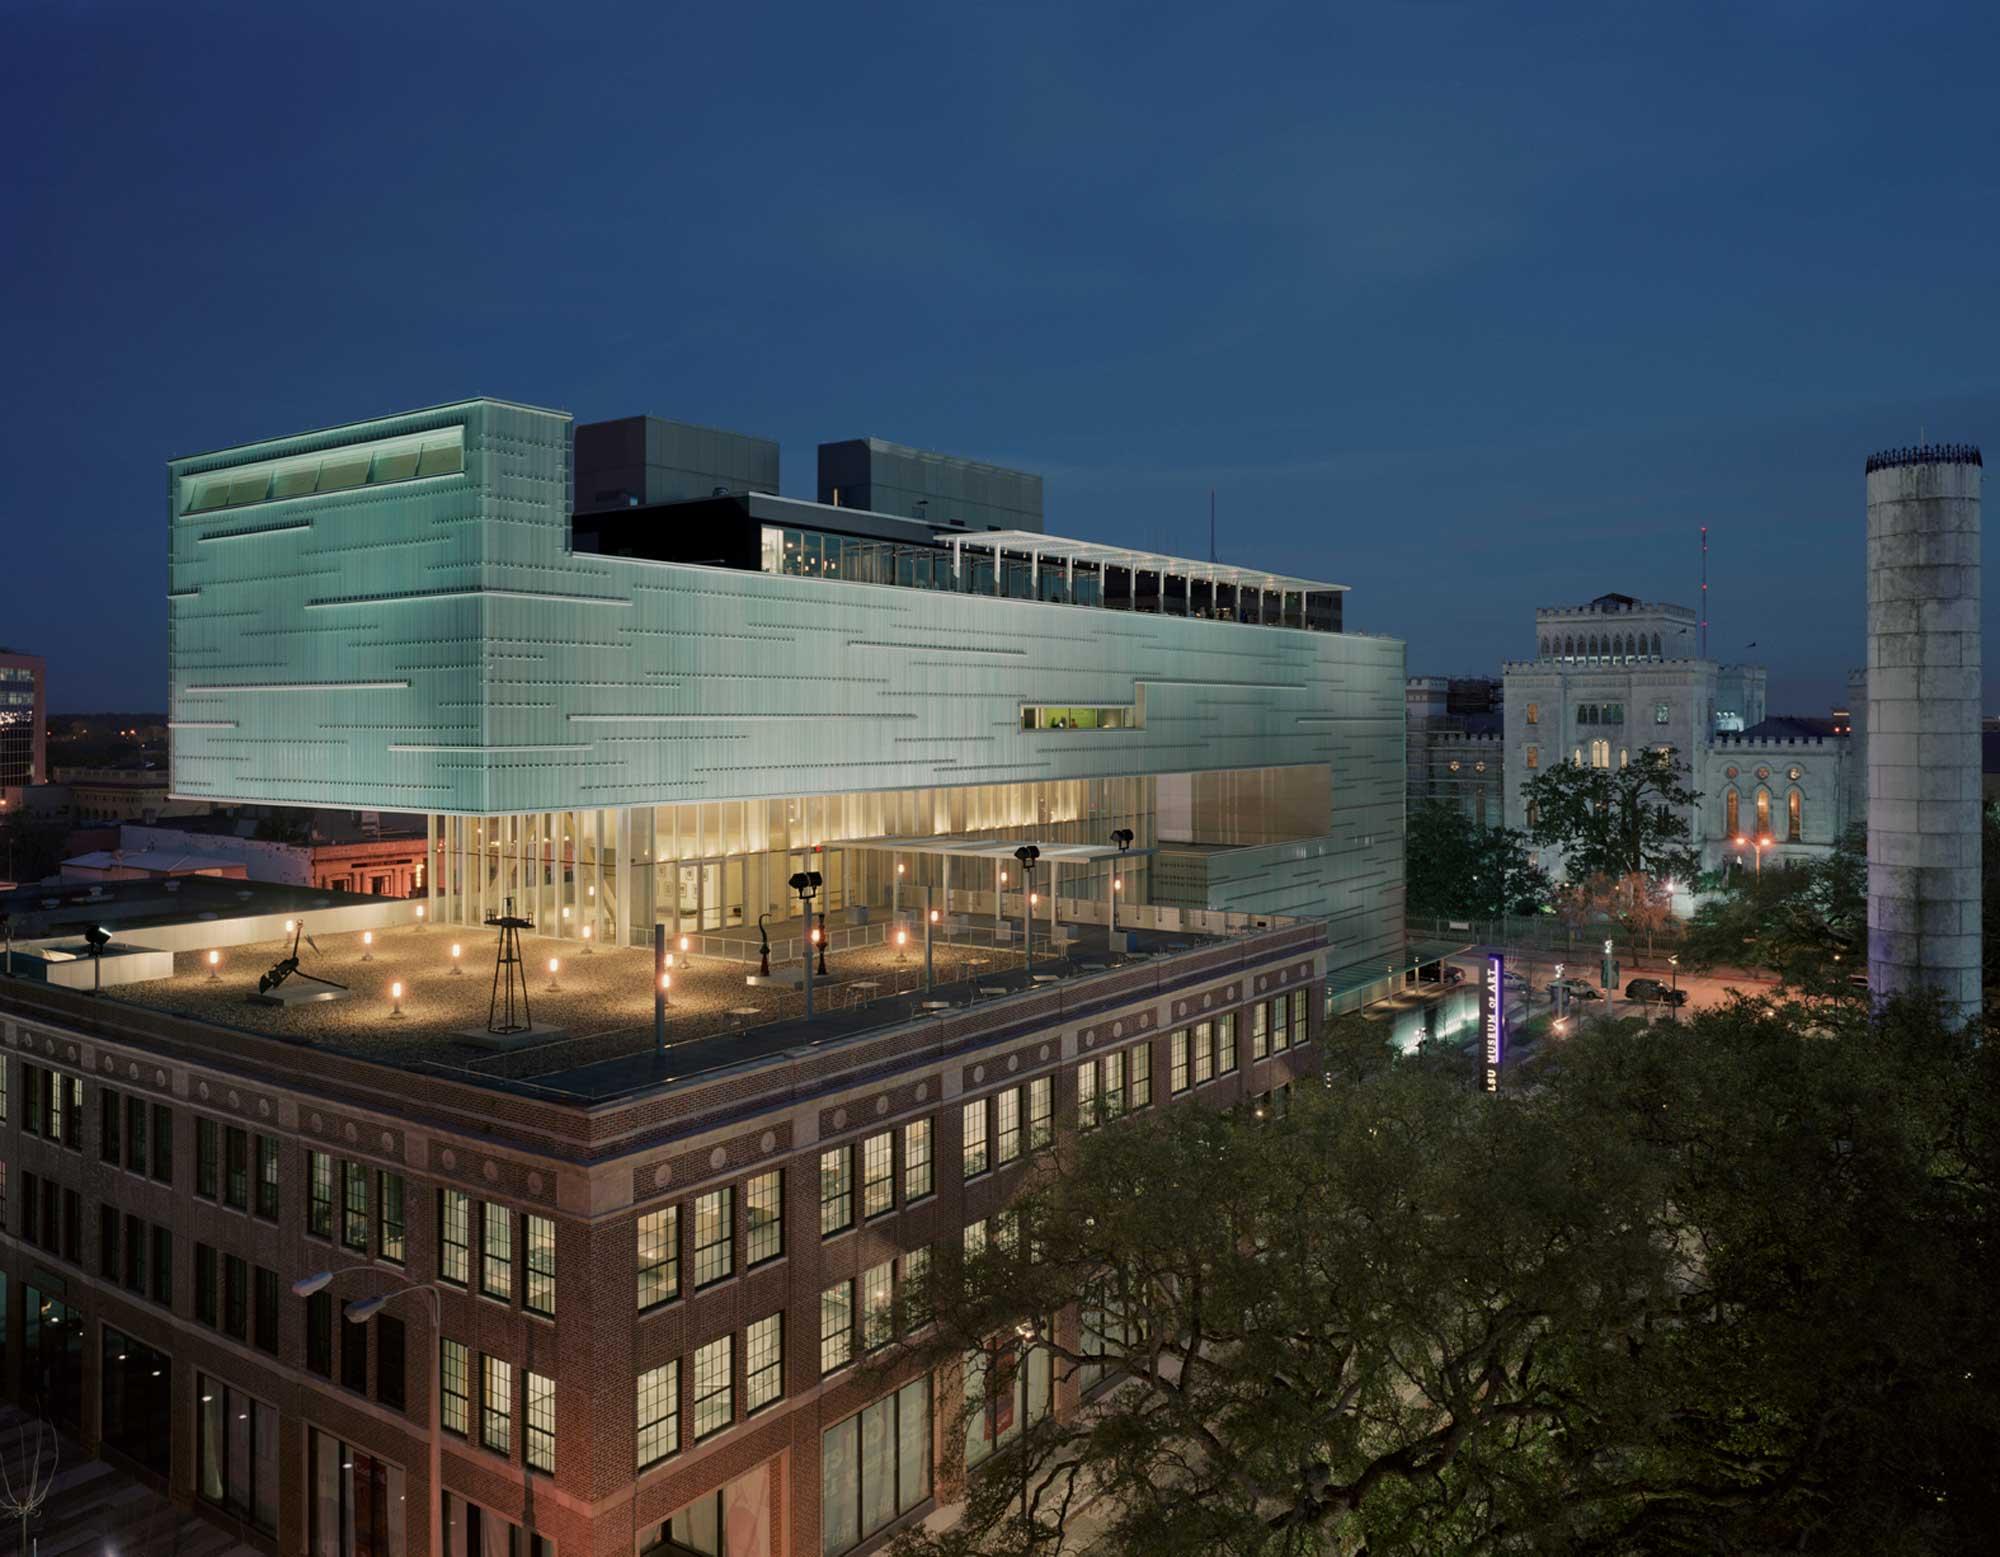 Shaw Center for the Arts, University of Louisiana at Baton Rouge -